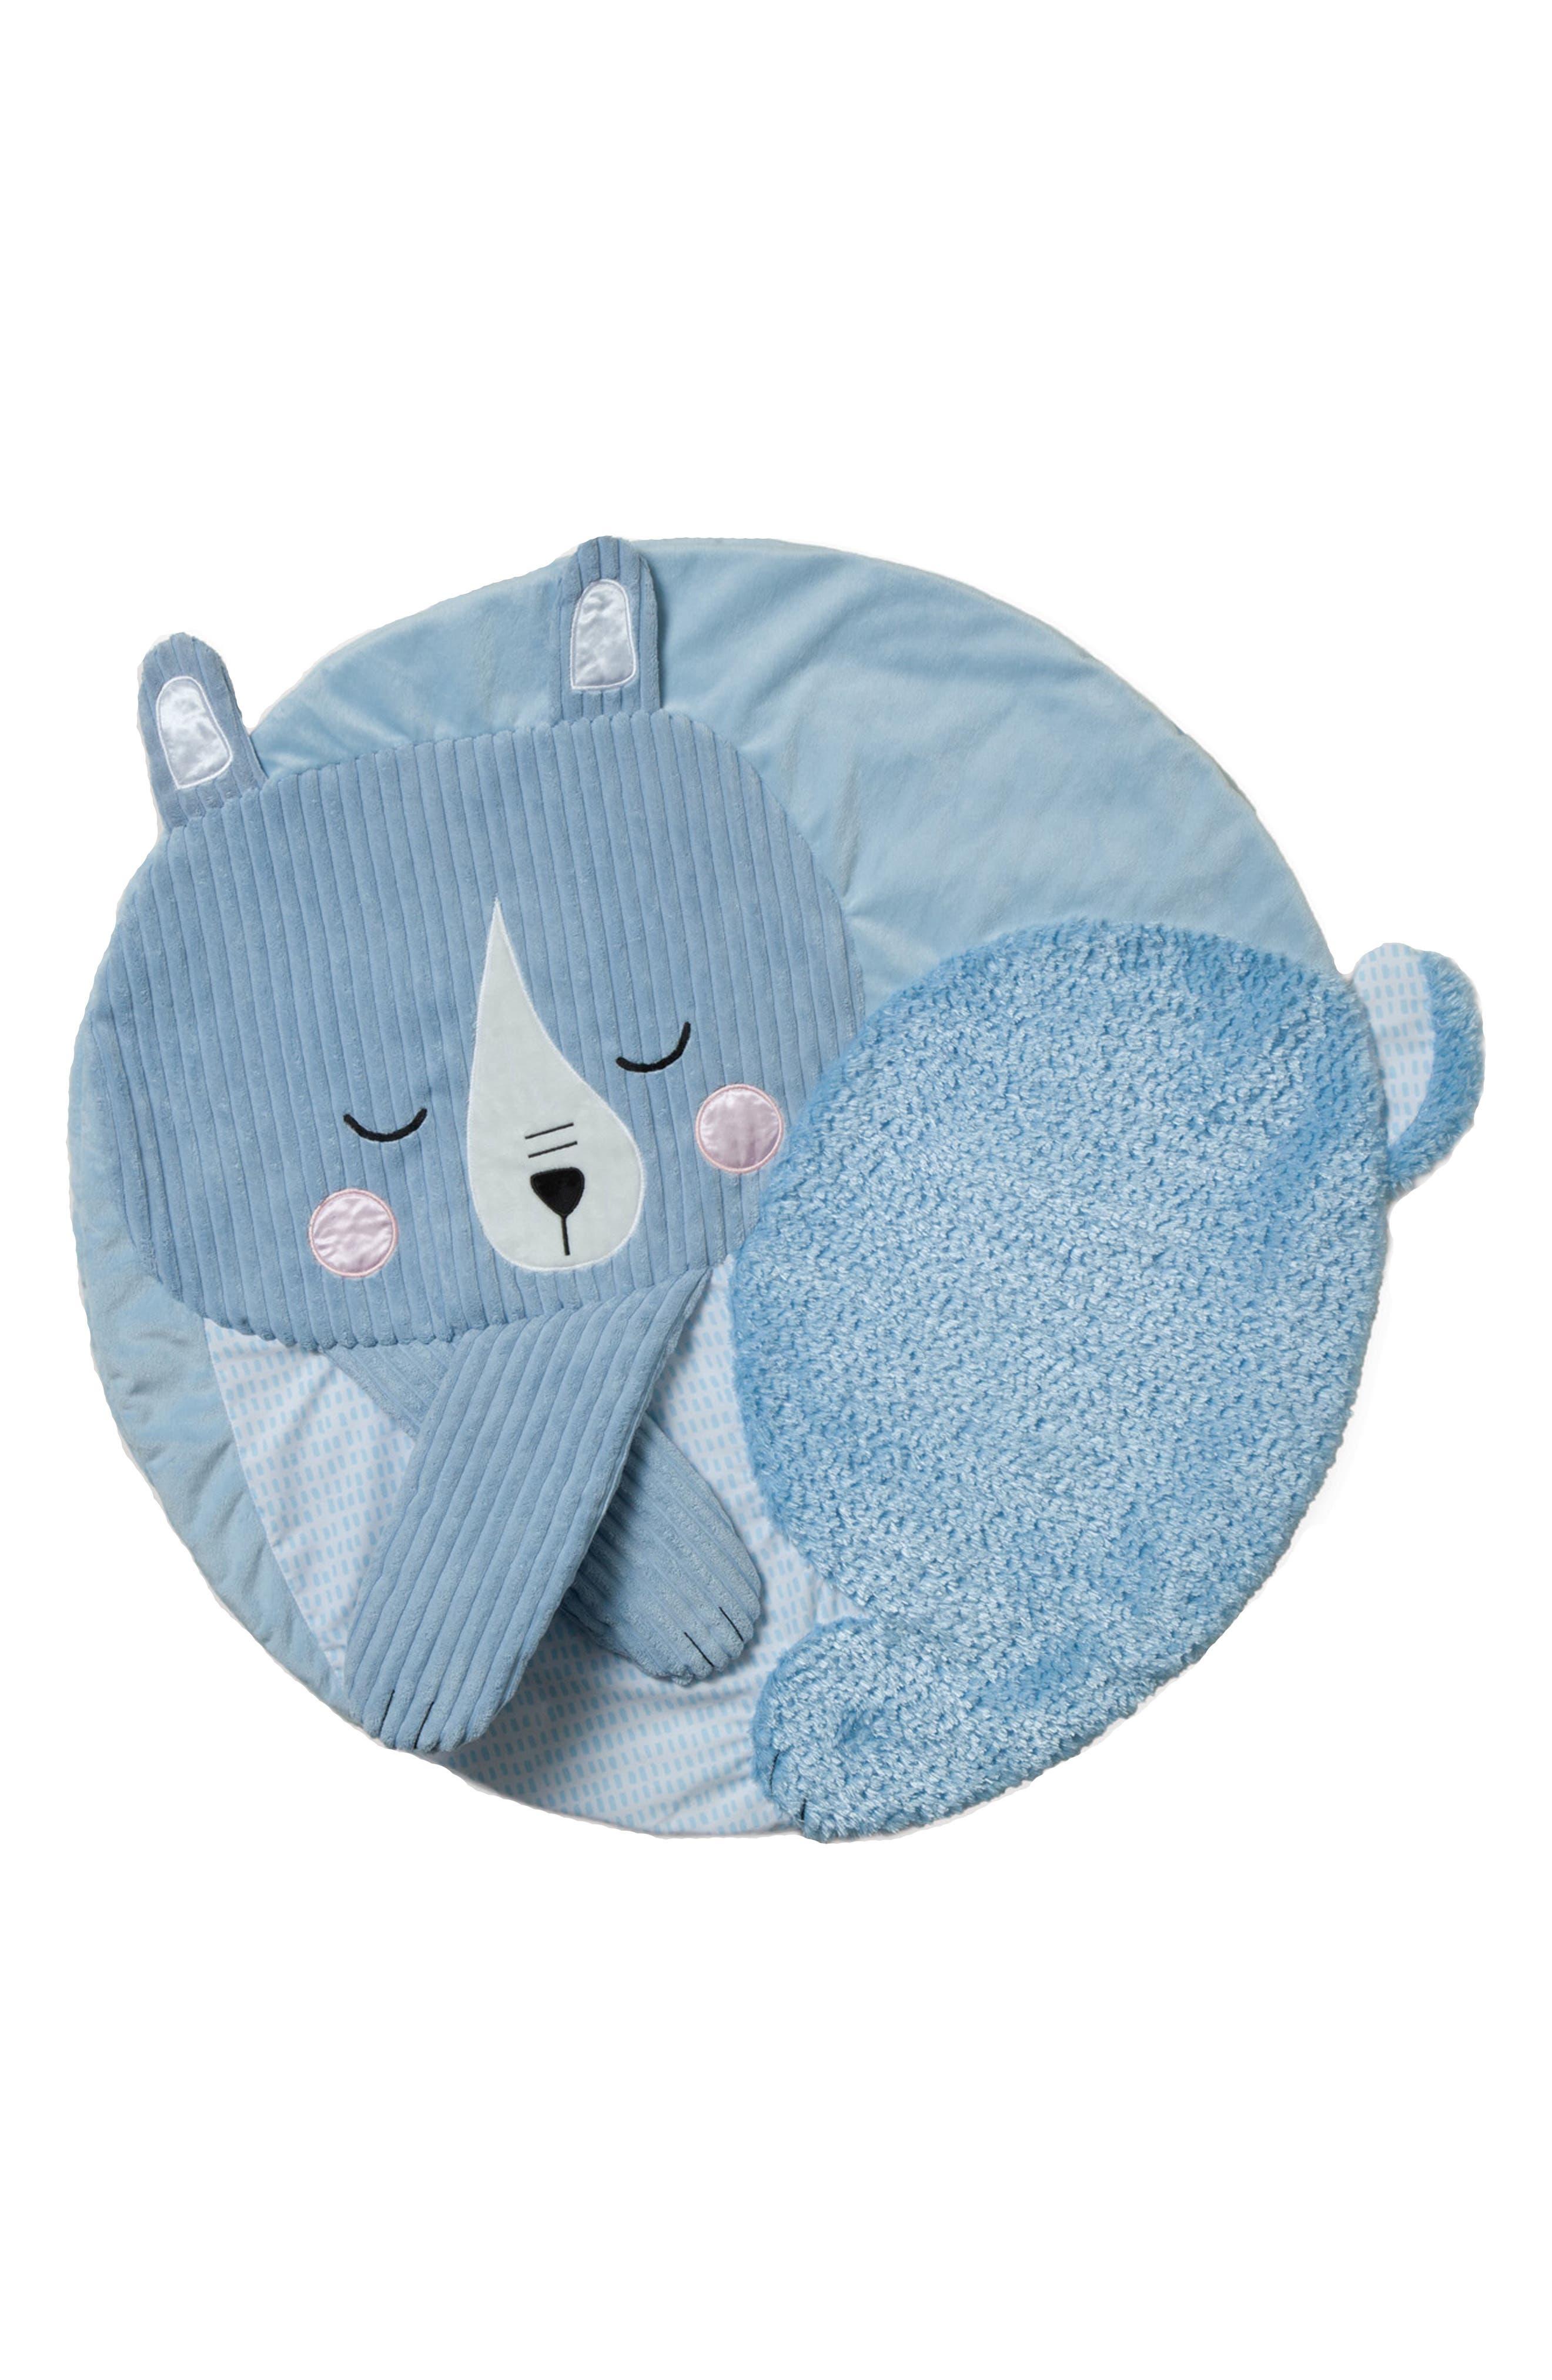 Bear Tactile Playmat,                             Main thumbnail 1, color,